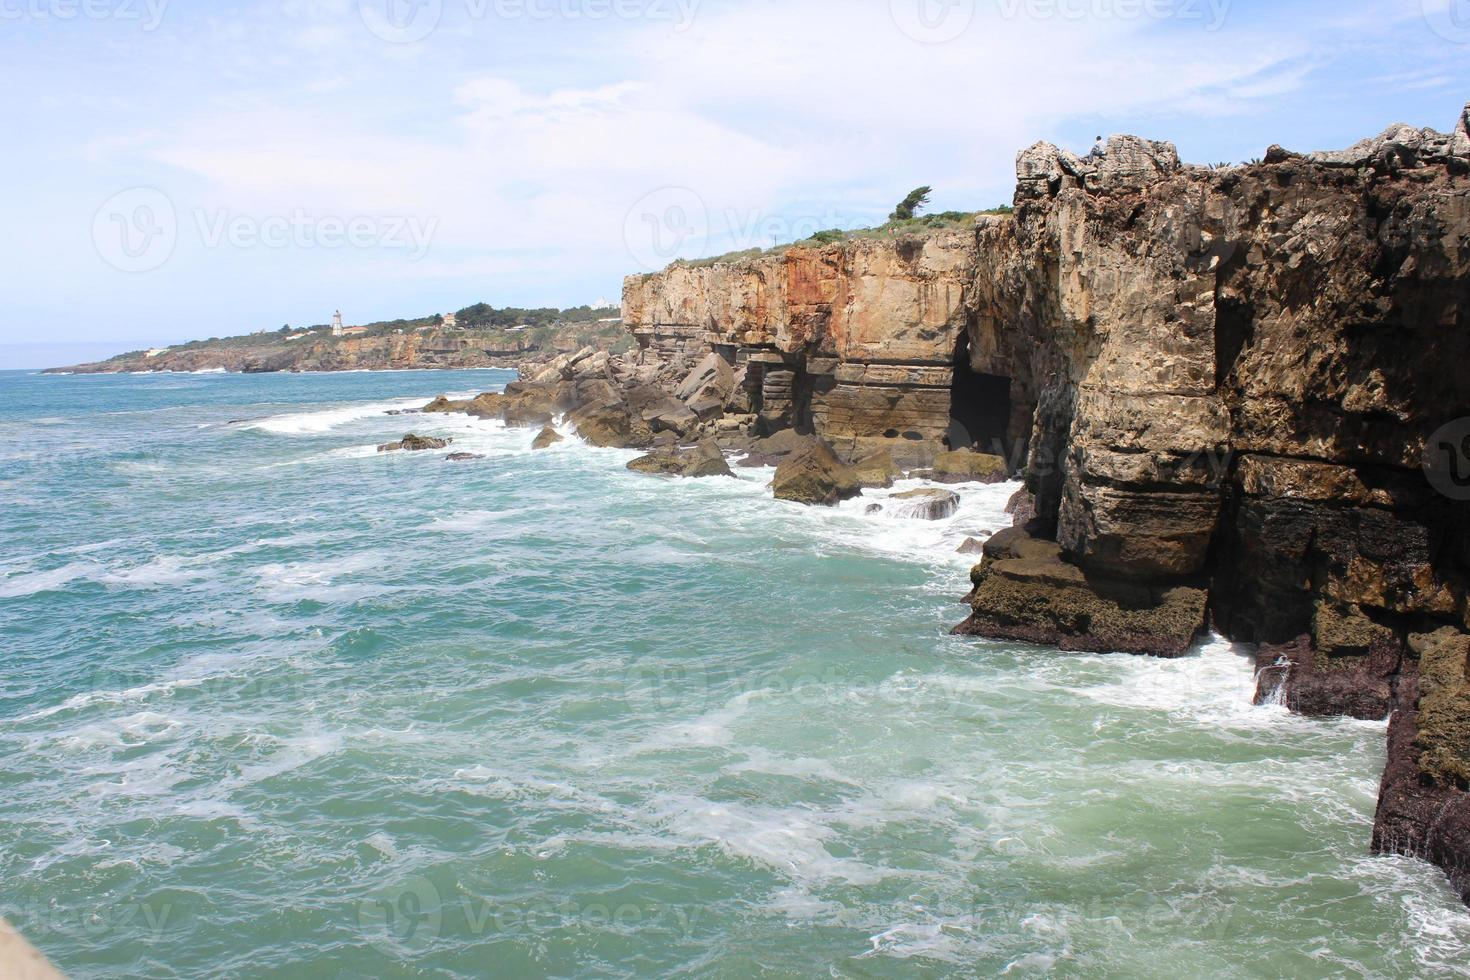 klif en zee, cascais, lissabon, portugal foto